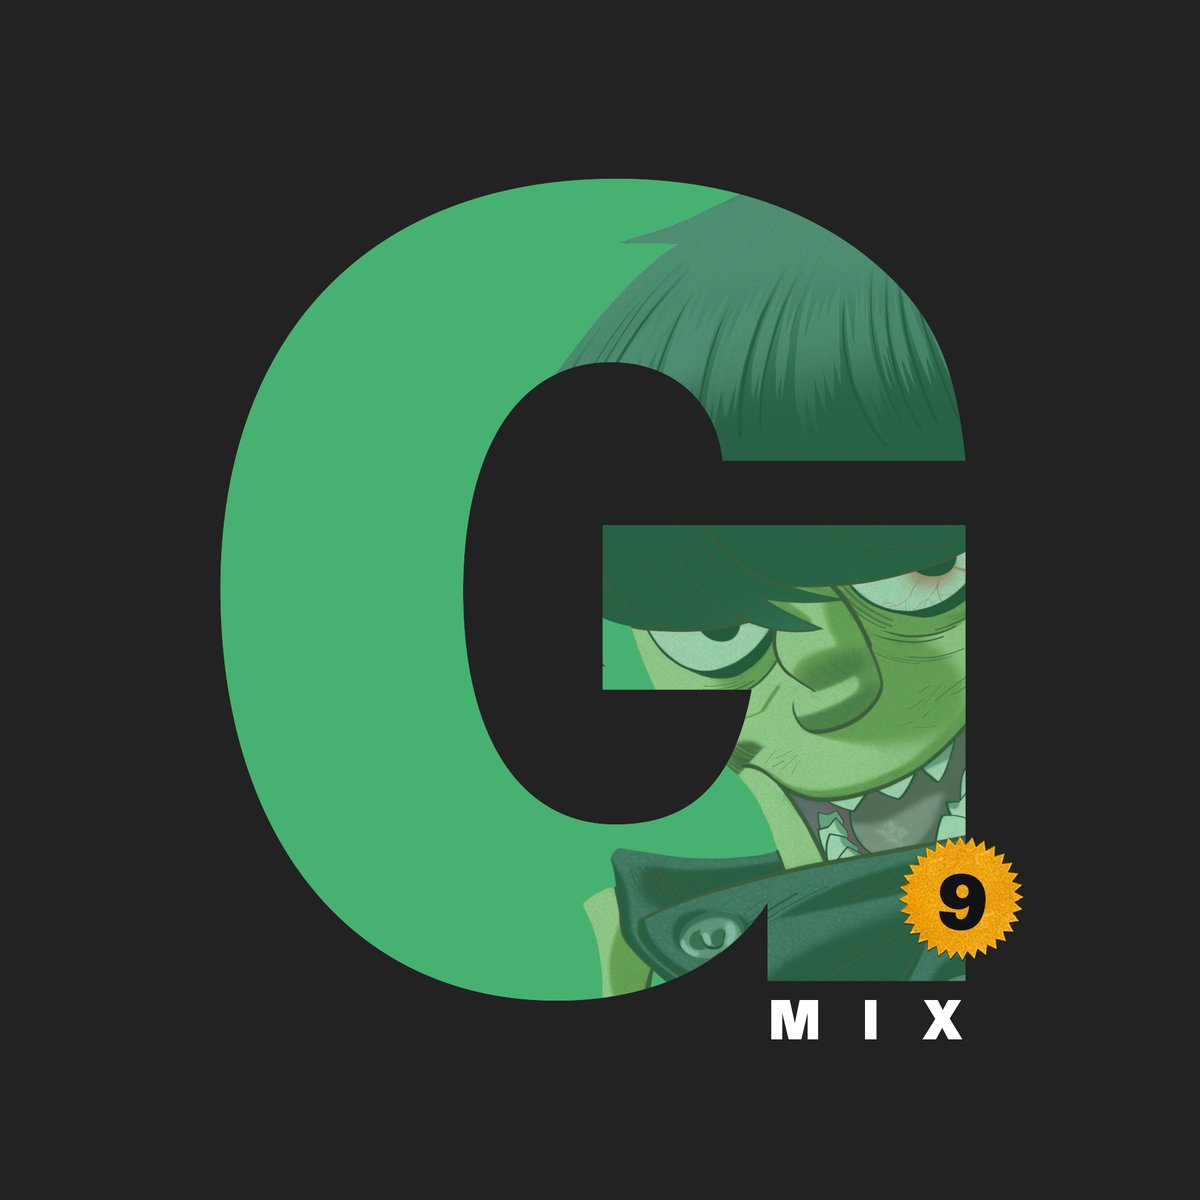 G-Mix: Murdoc 9